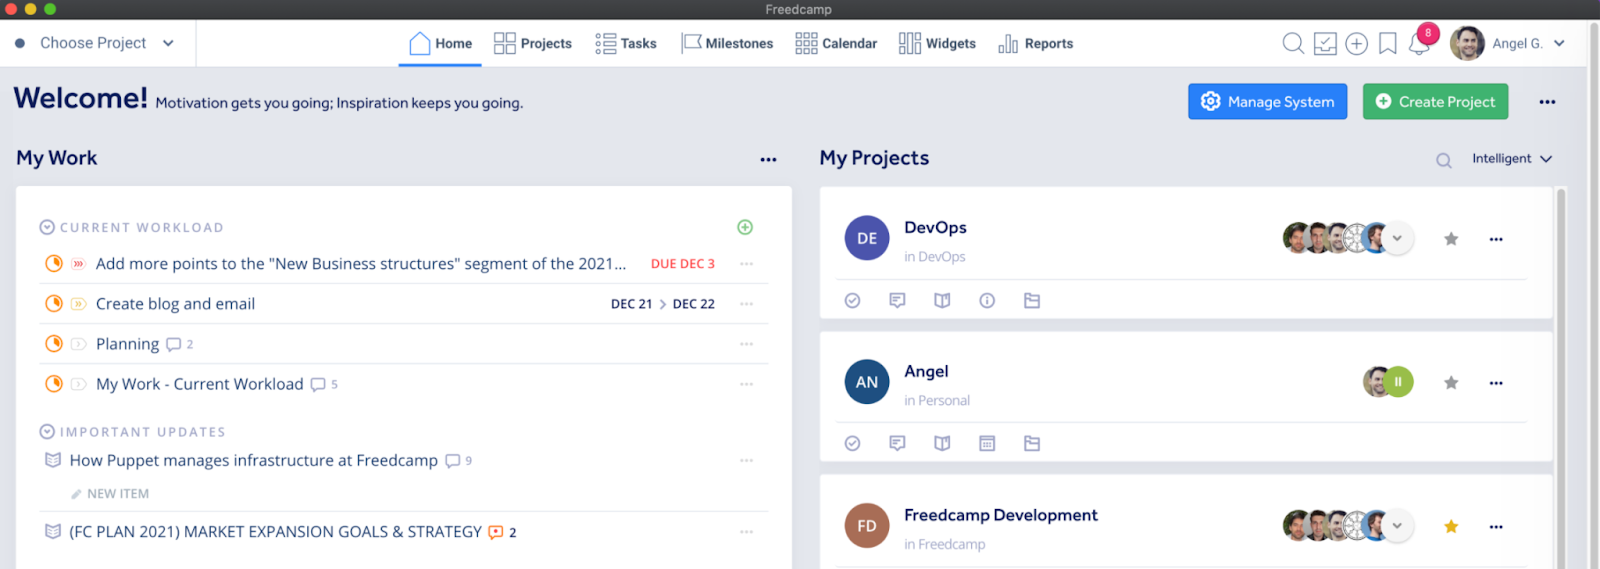 Freedcamp's interface